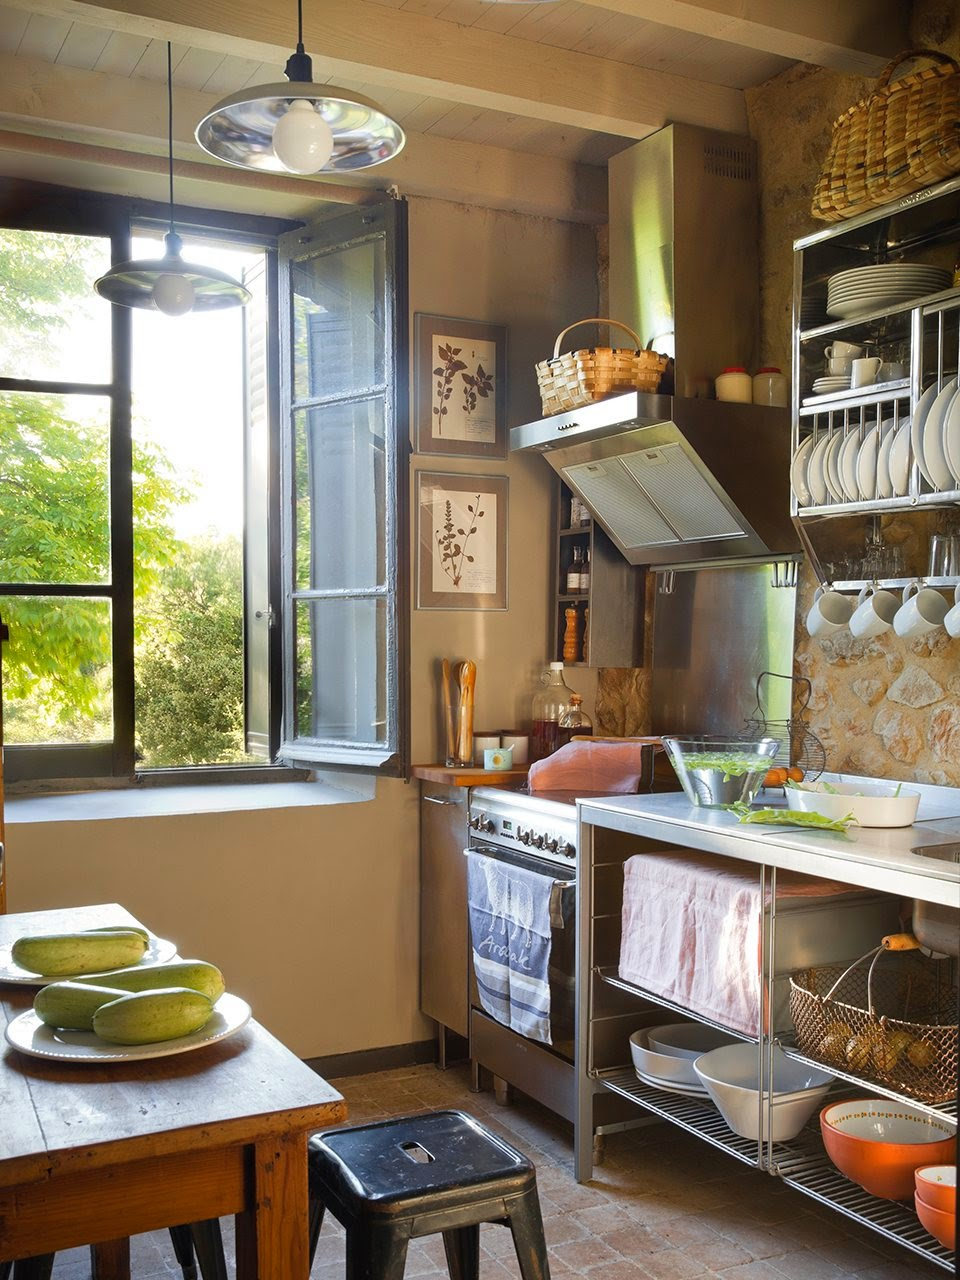 amenajari, interioare, decoratiuni, decor, design interior, stil rustic, reconversie, zid de piatra, bucatarie